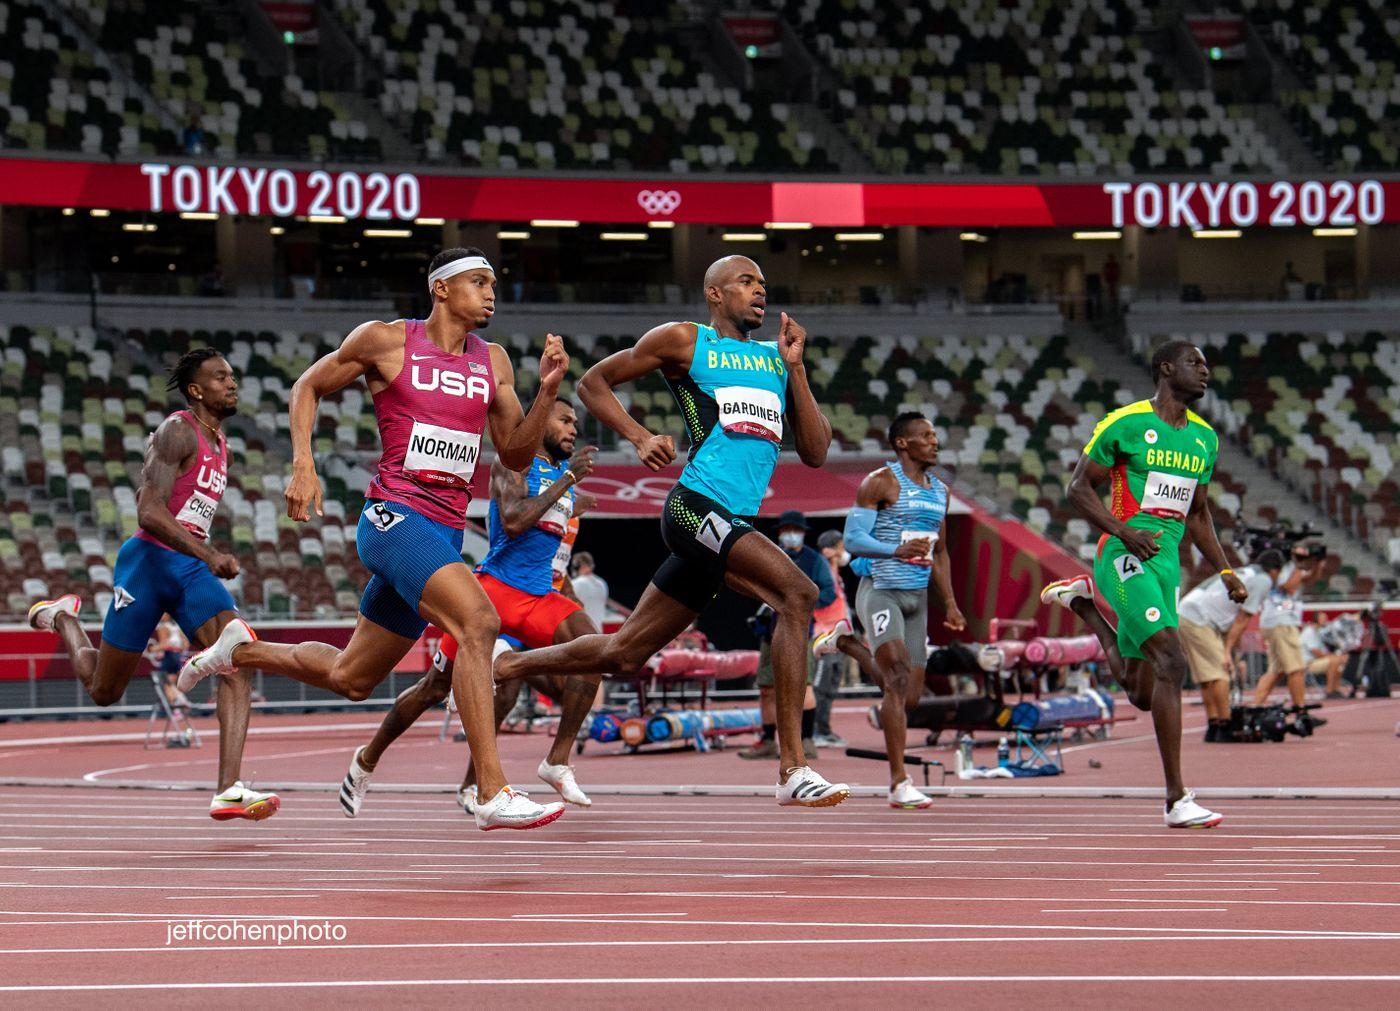 400m-2020-tokyo-oly-day-7-night-2634-jeff-cohen-photo---copy-web.jpg